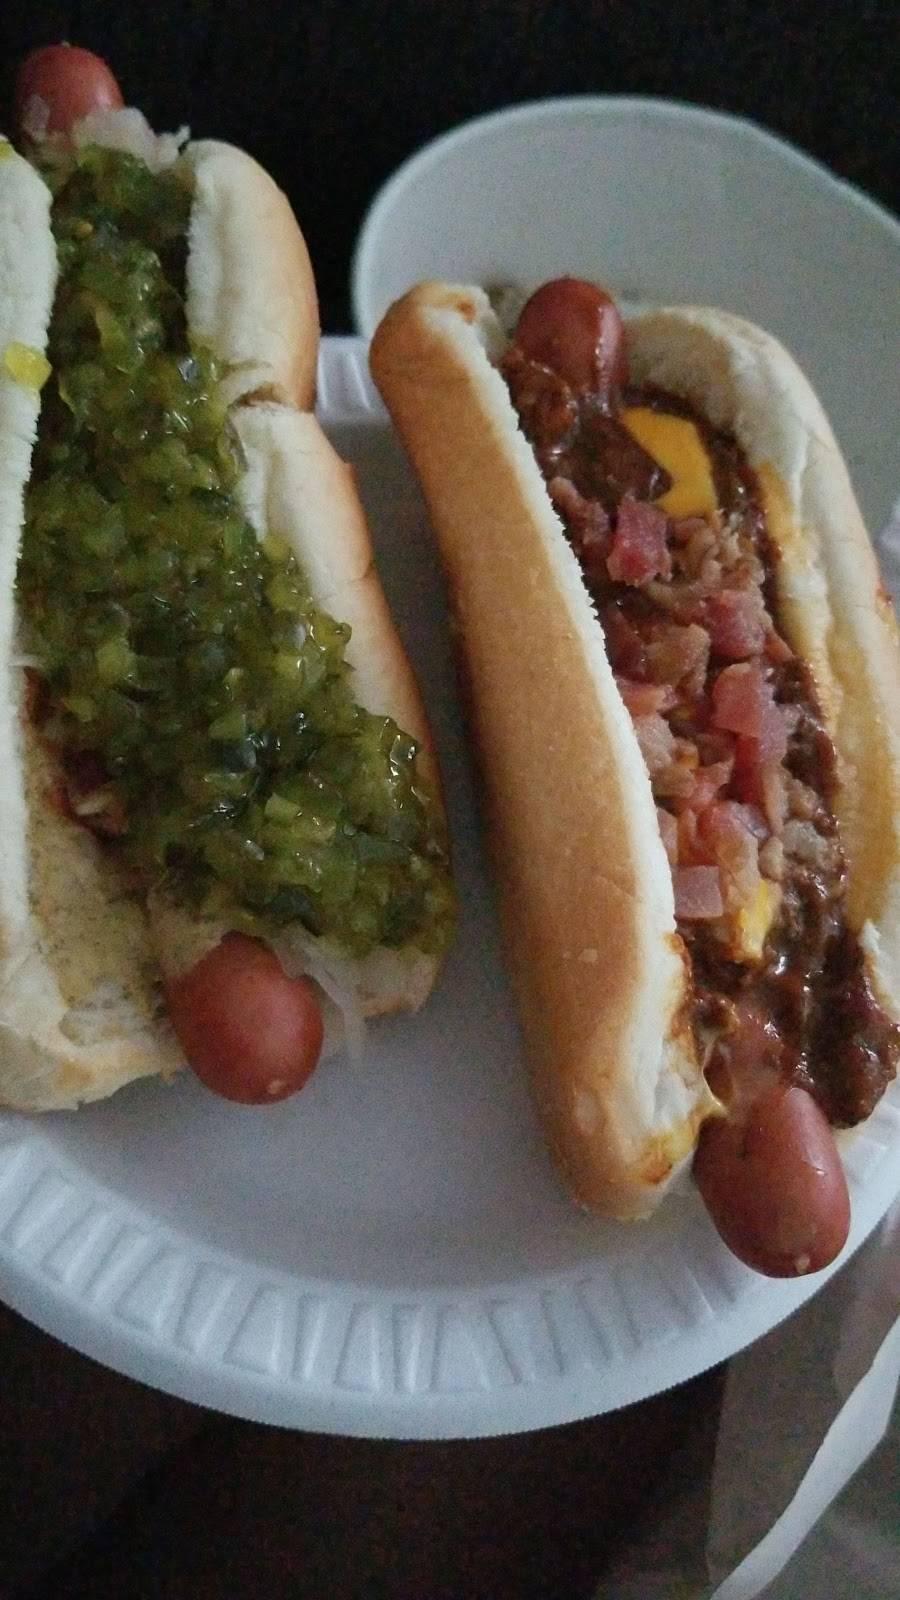 Hot Dog House | restaurant | 510 NJ-17, Carlstadt, NJ 07072, USA | 2019355803 OR +1 201-935-5803